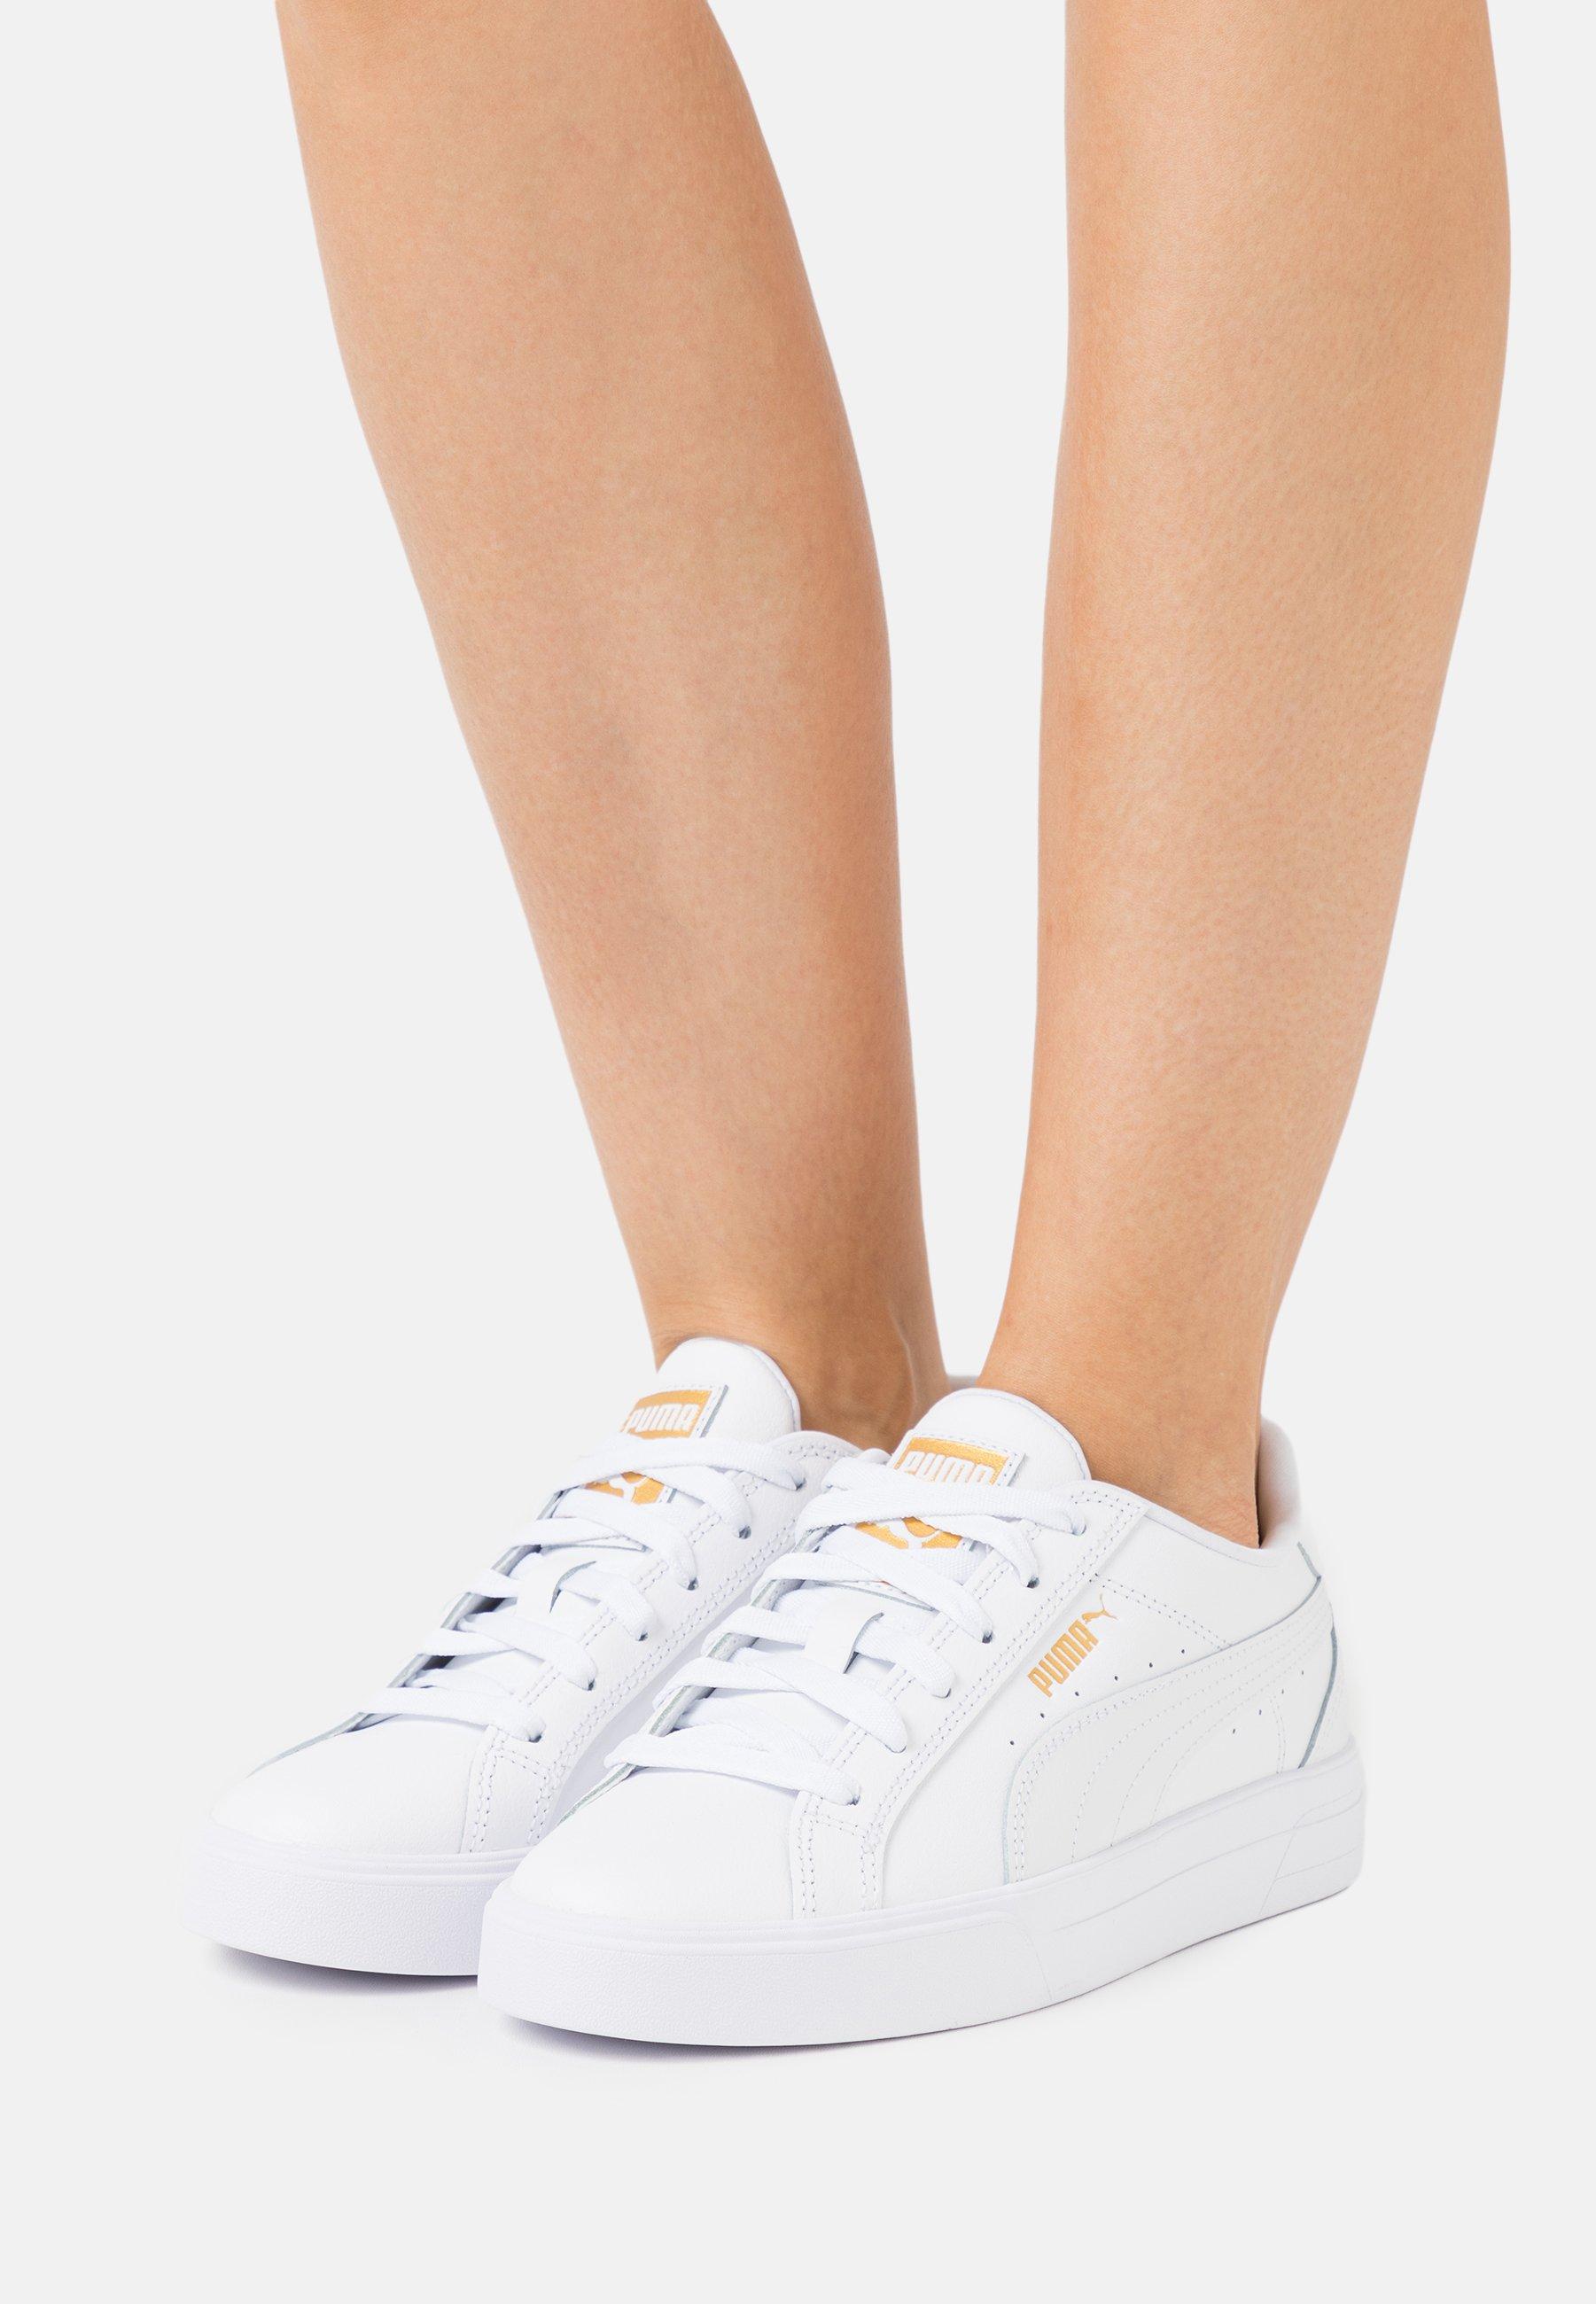 ANA - Trainers - white